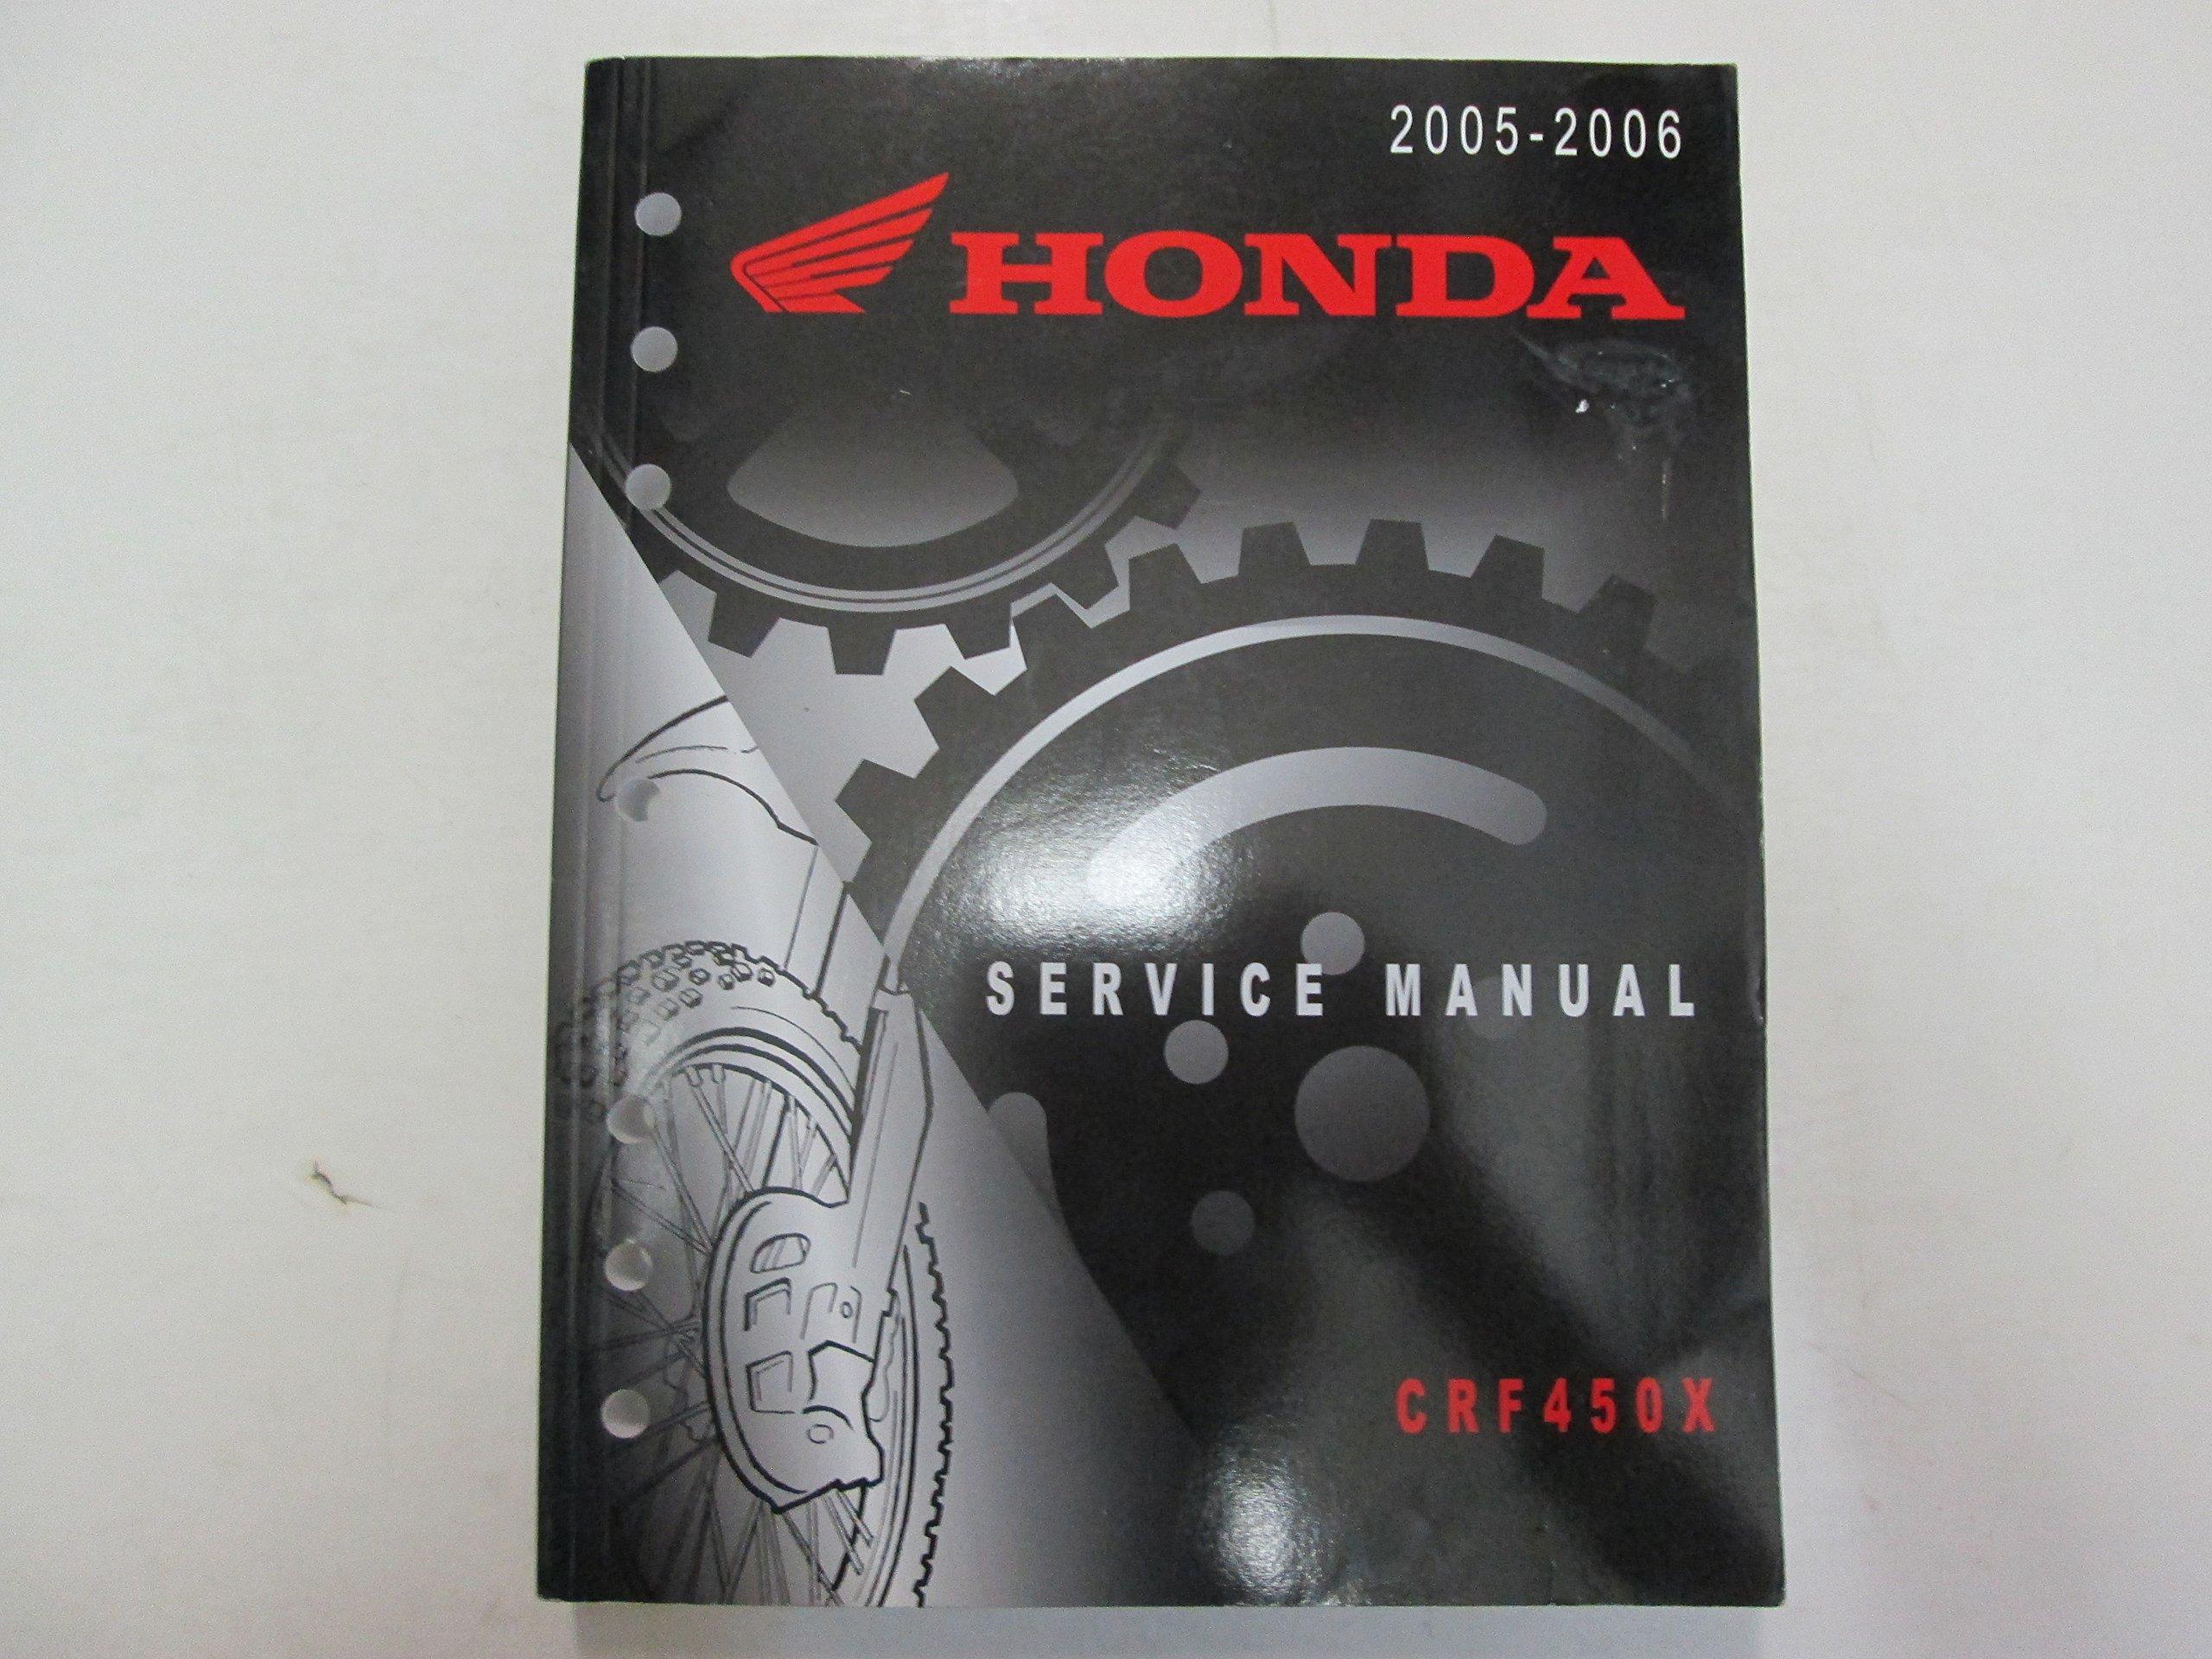 Service manual / 2005 2012 honda crf450x frank! Mxparts.